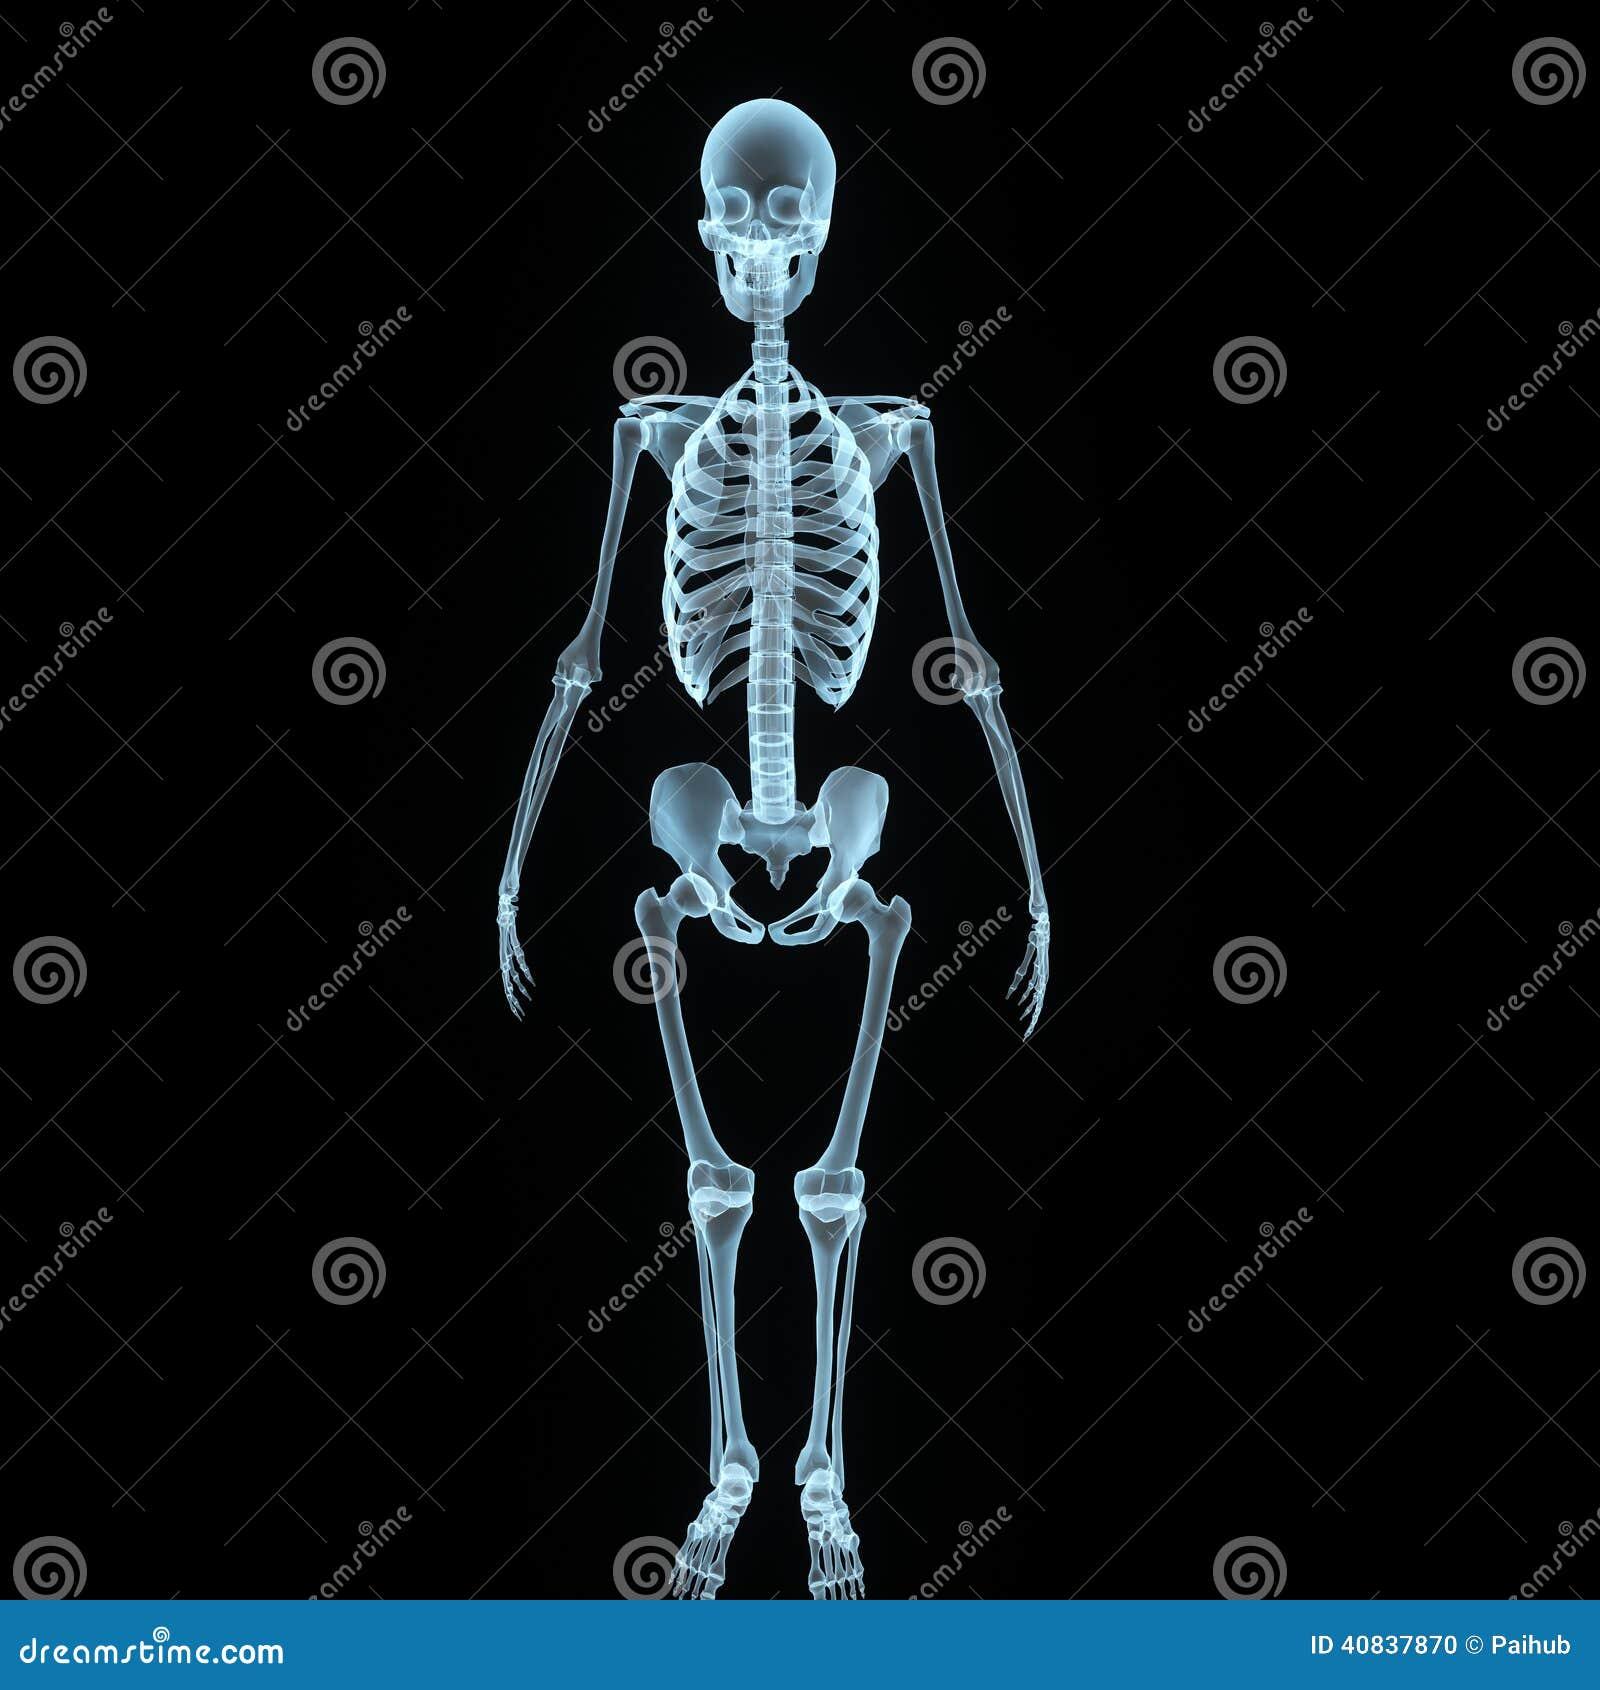 Skeleton Front View Stock Illustration - Image: 40837870